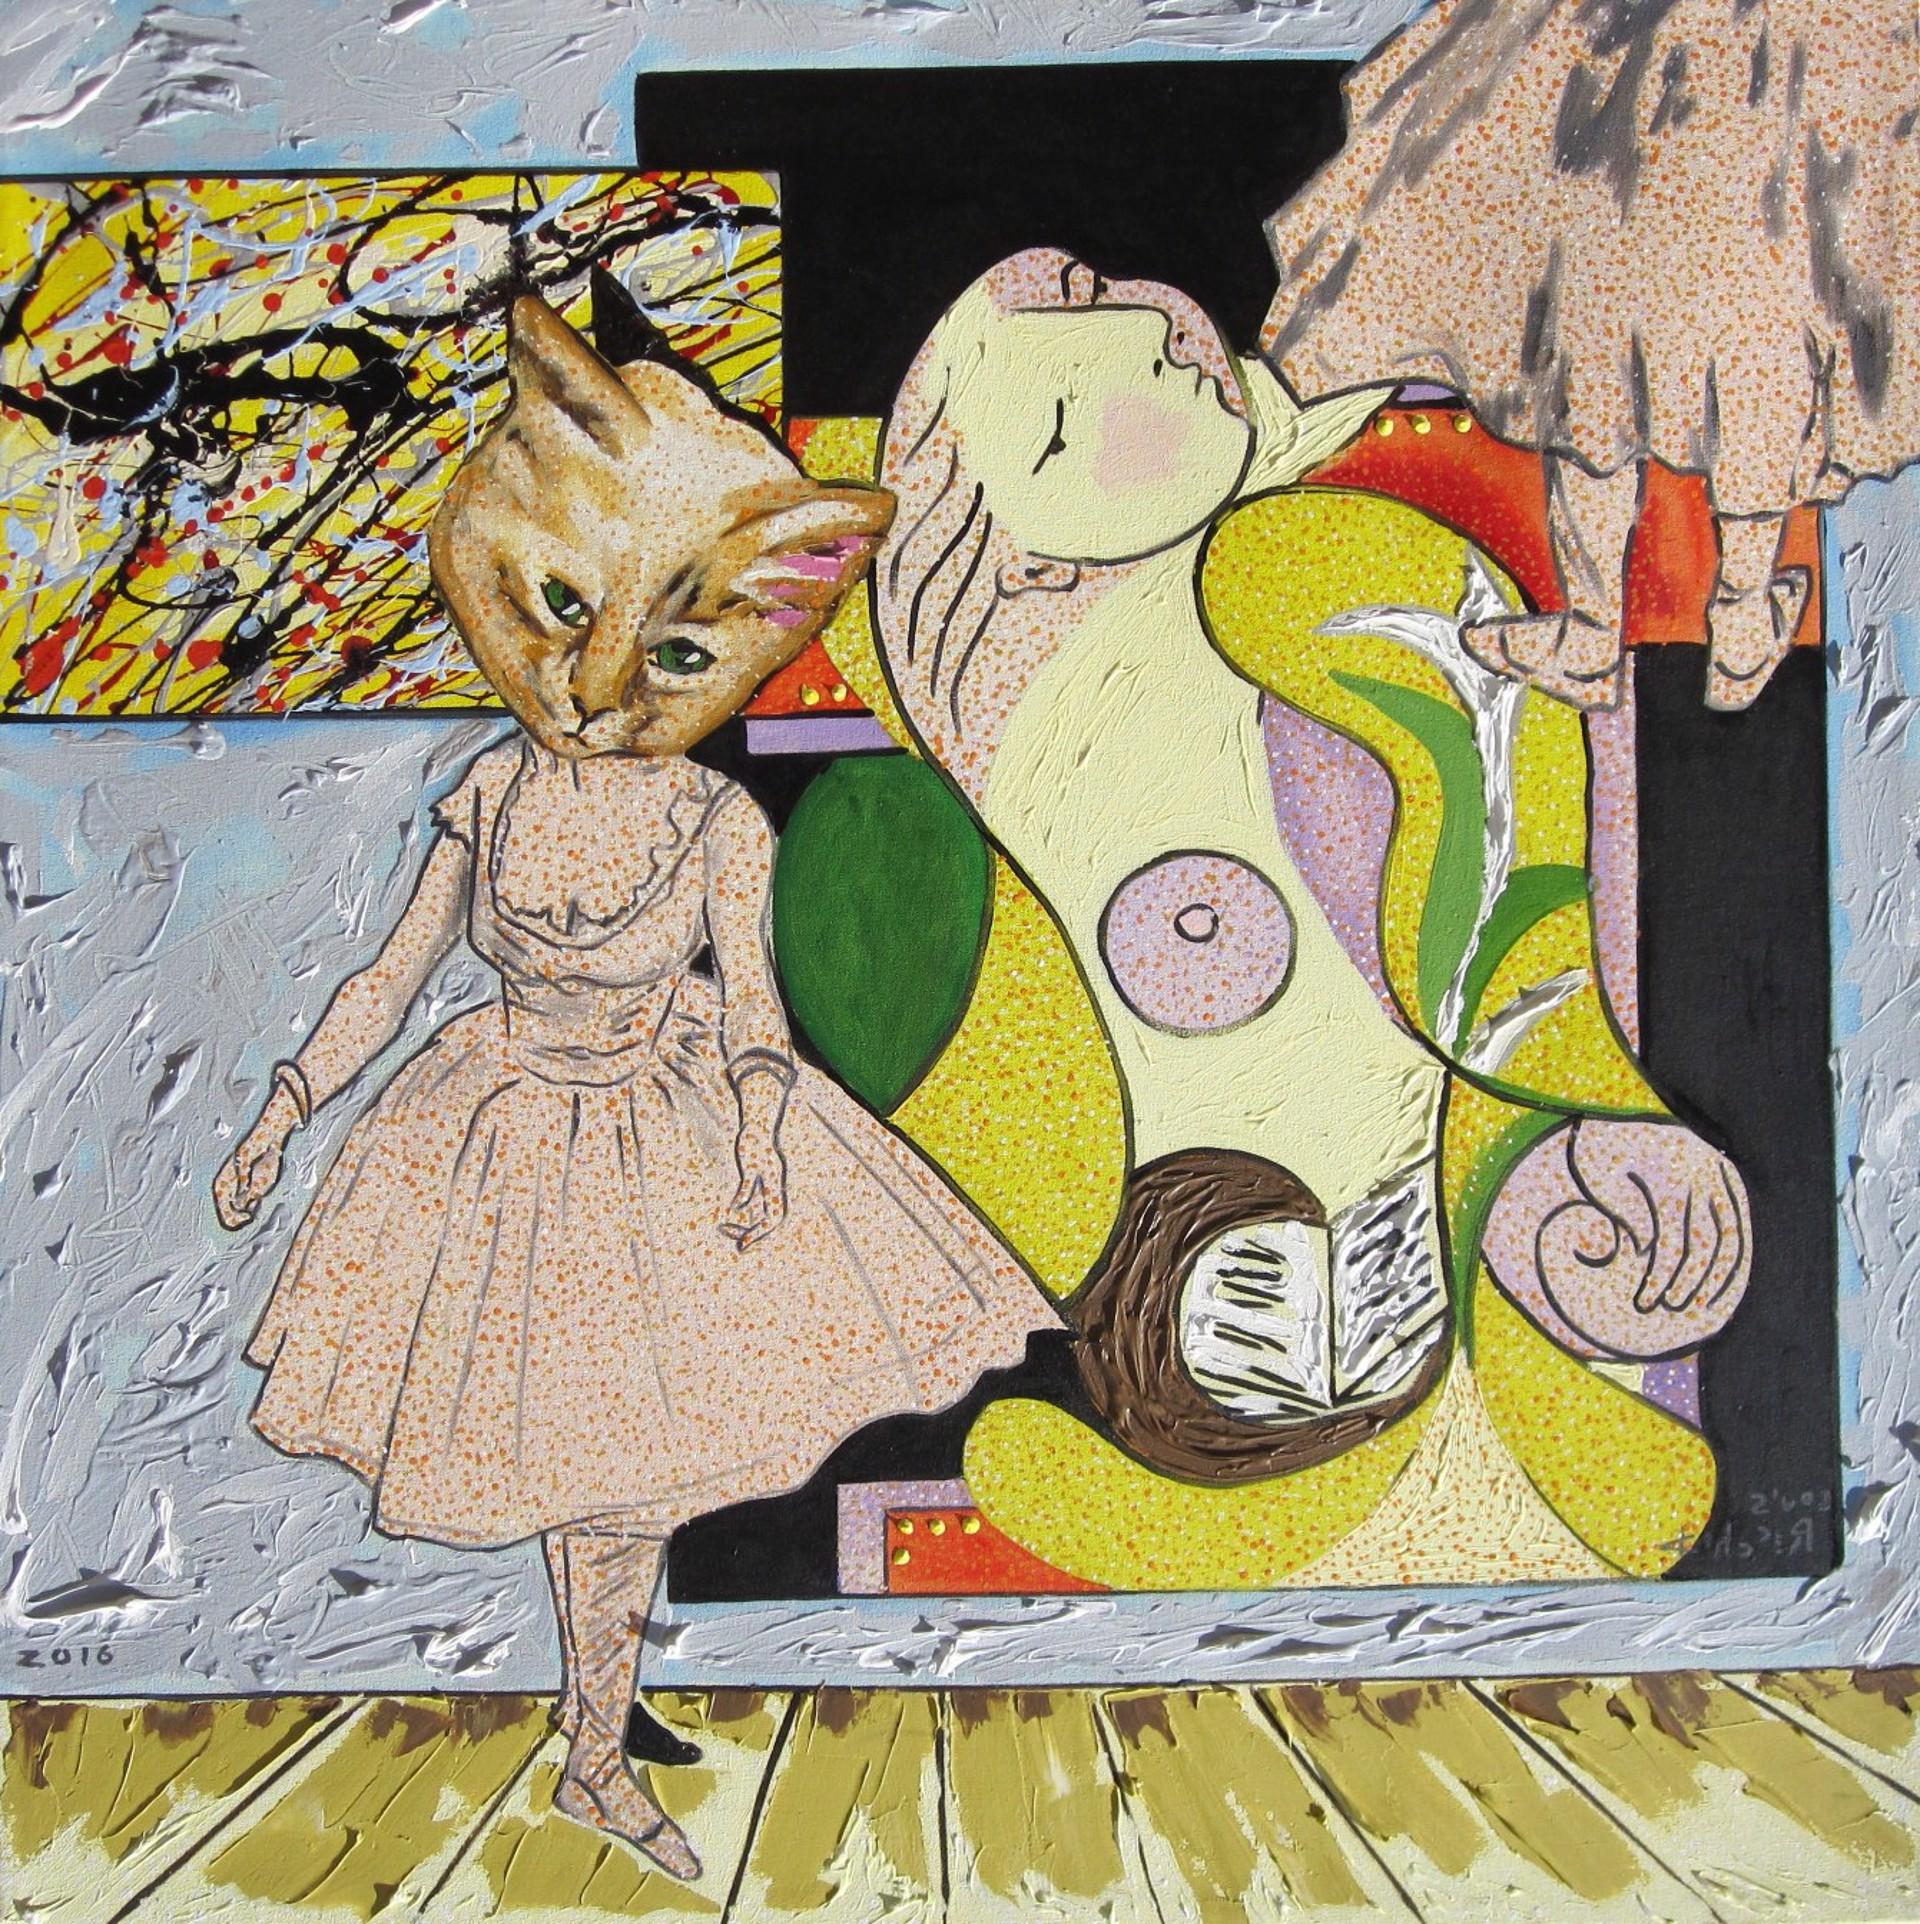 Cat Dancer by Louis Recchia